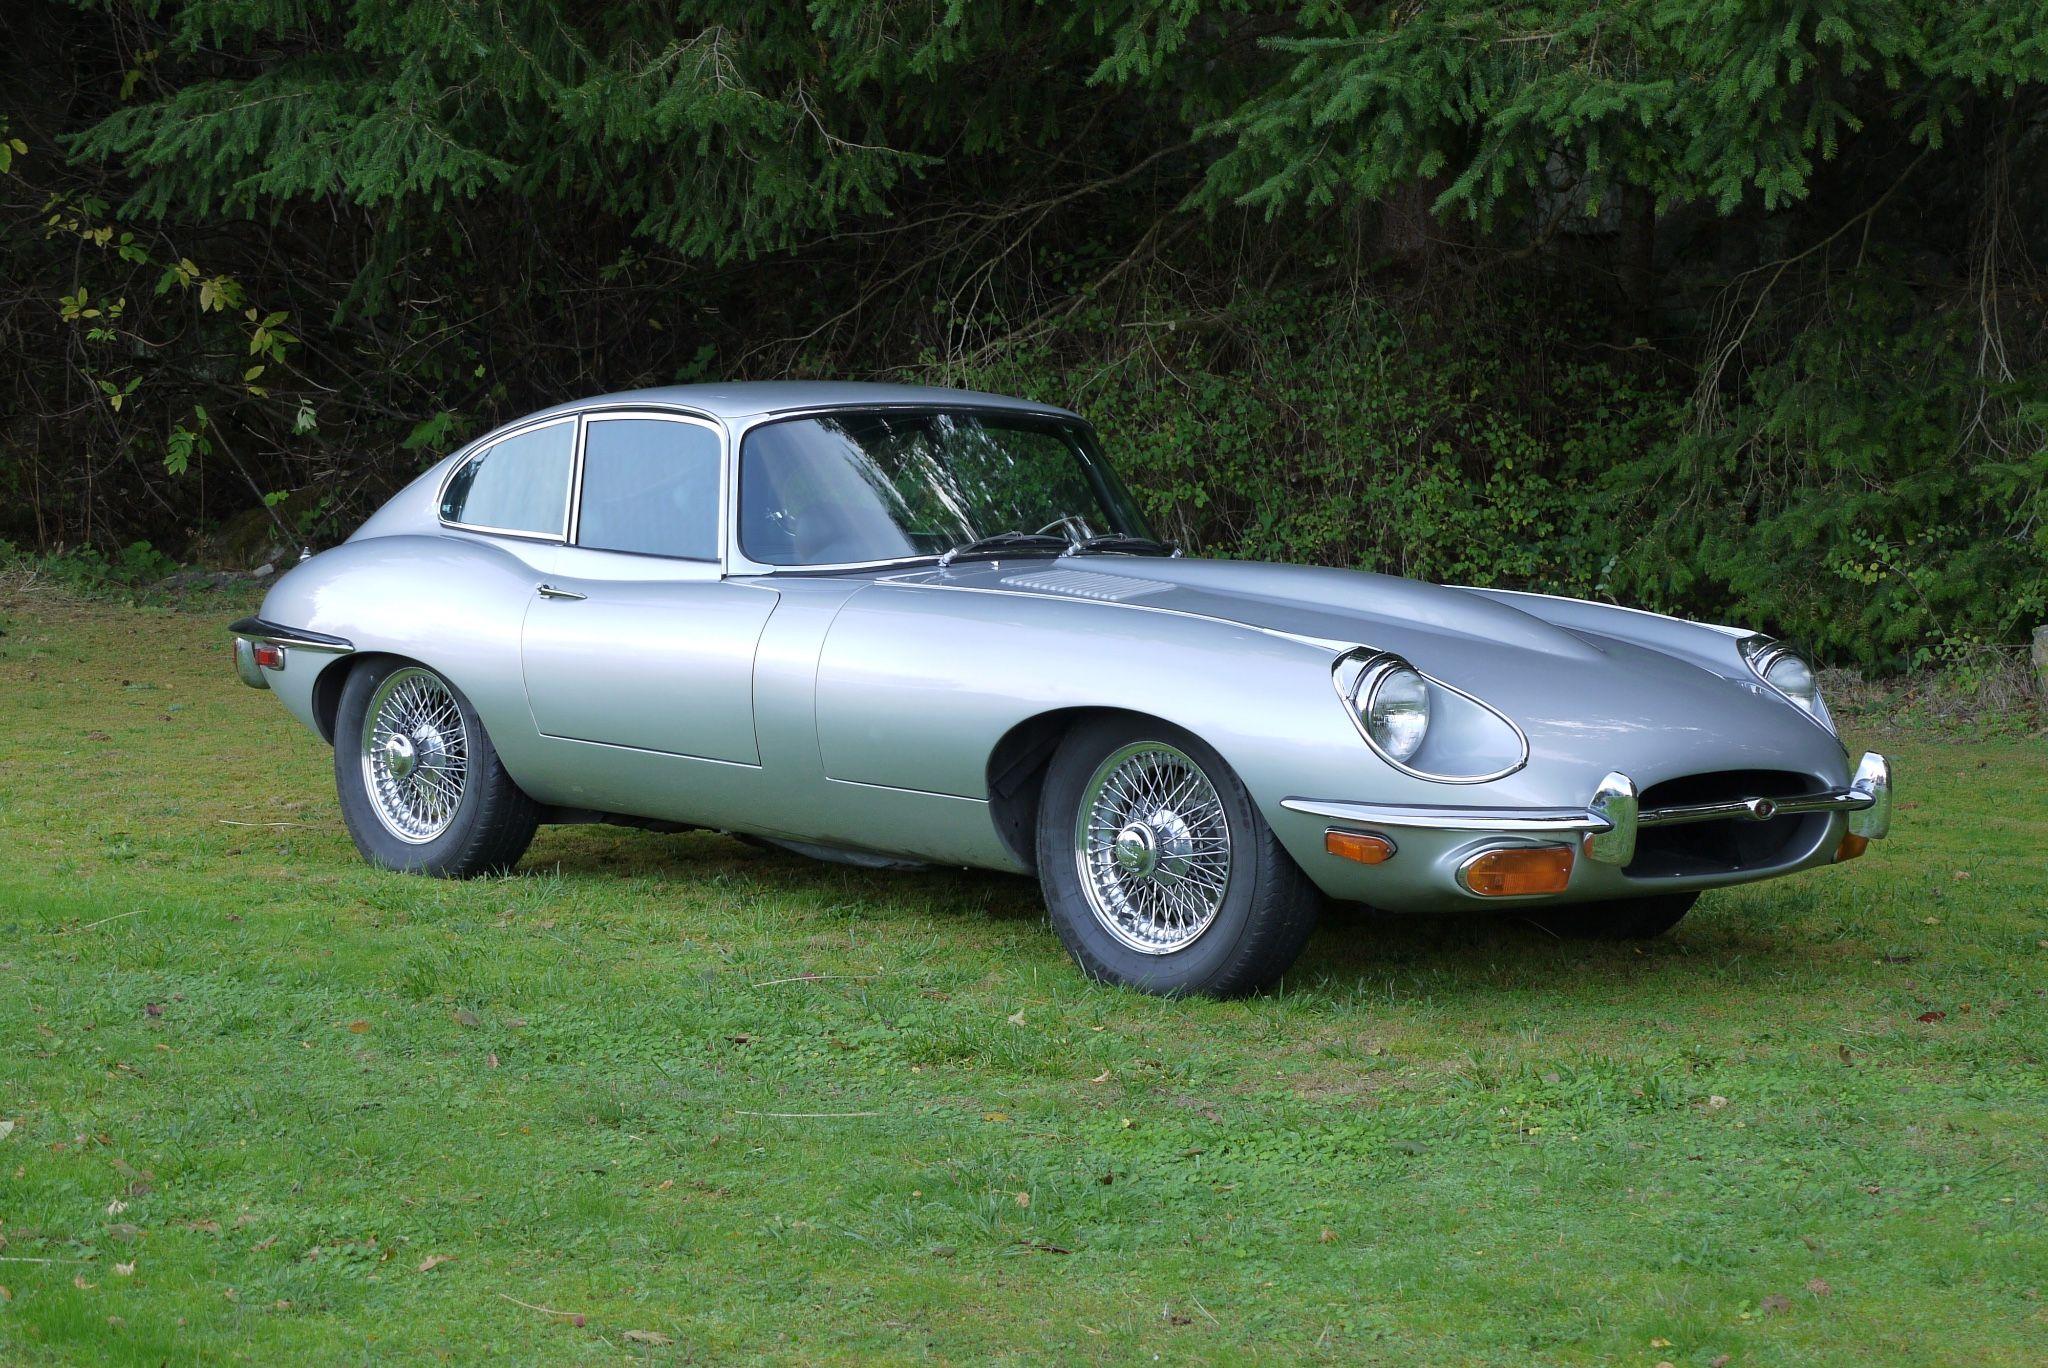 1970 Jaguar XKE 4.2 Fixed Head Coupe | Jaguar, Jaguar e type, Jaguar type